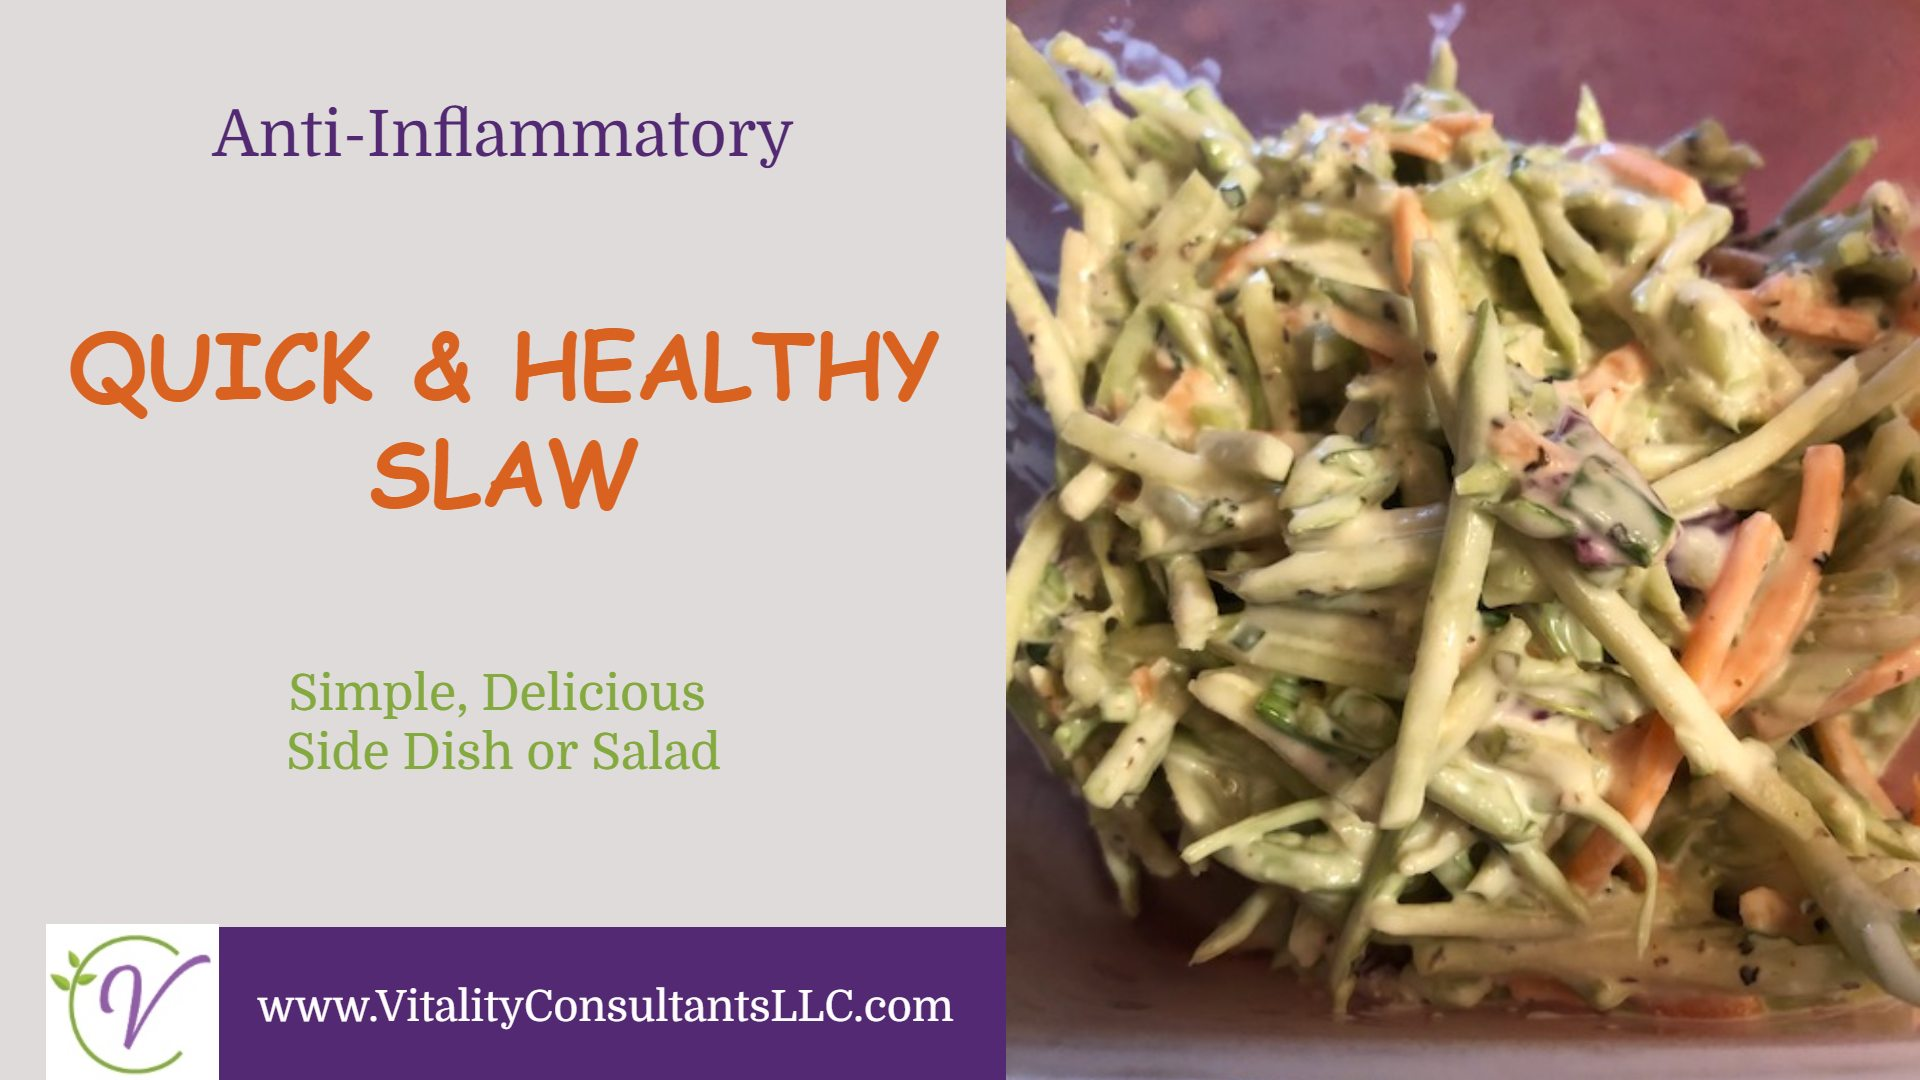 Quick & Healthy Slaw